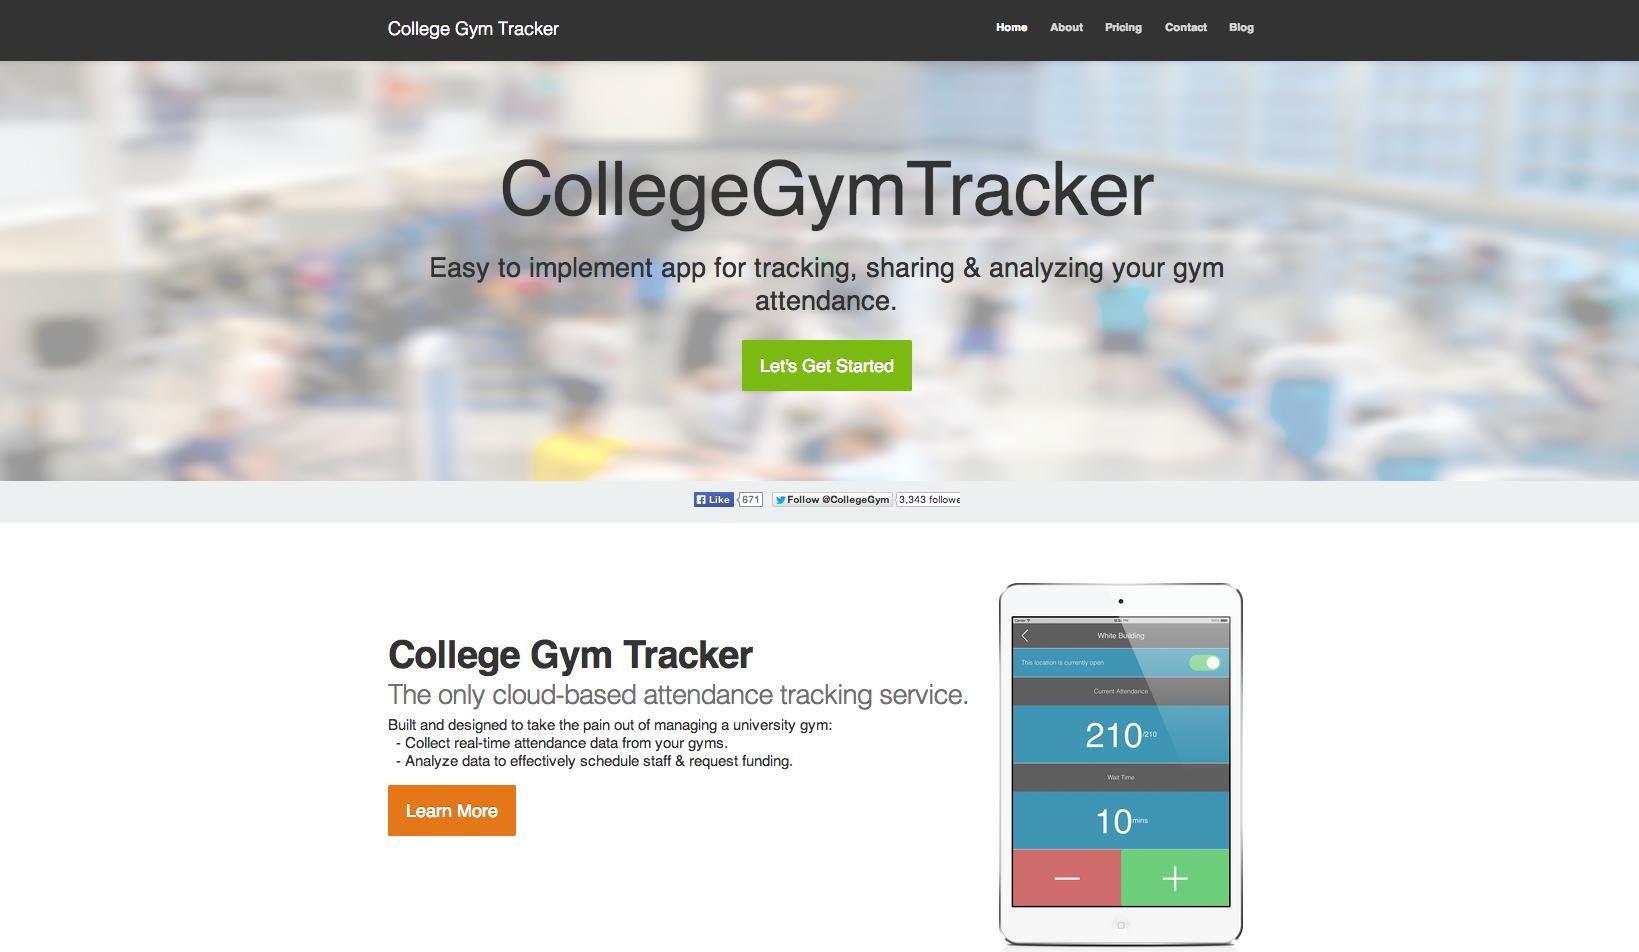 College Gym Tracker